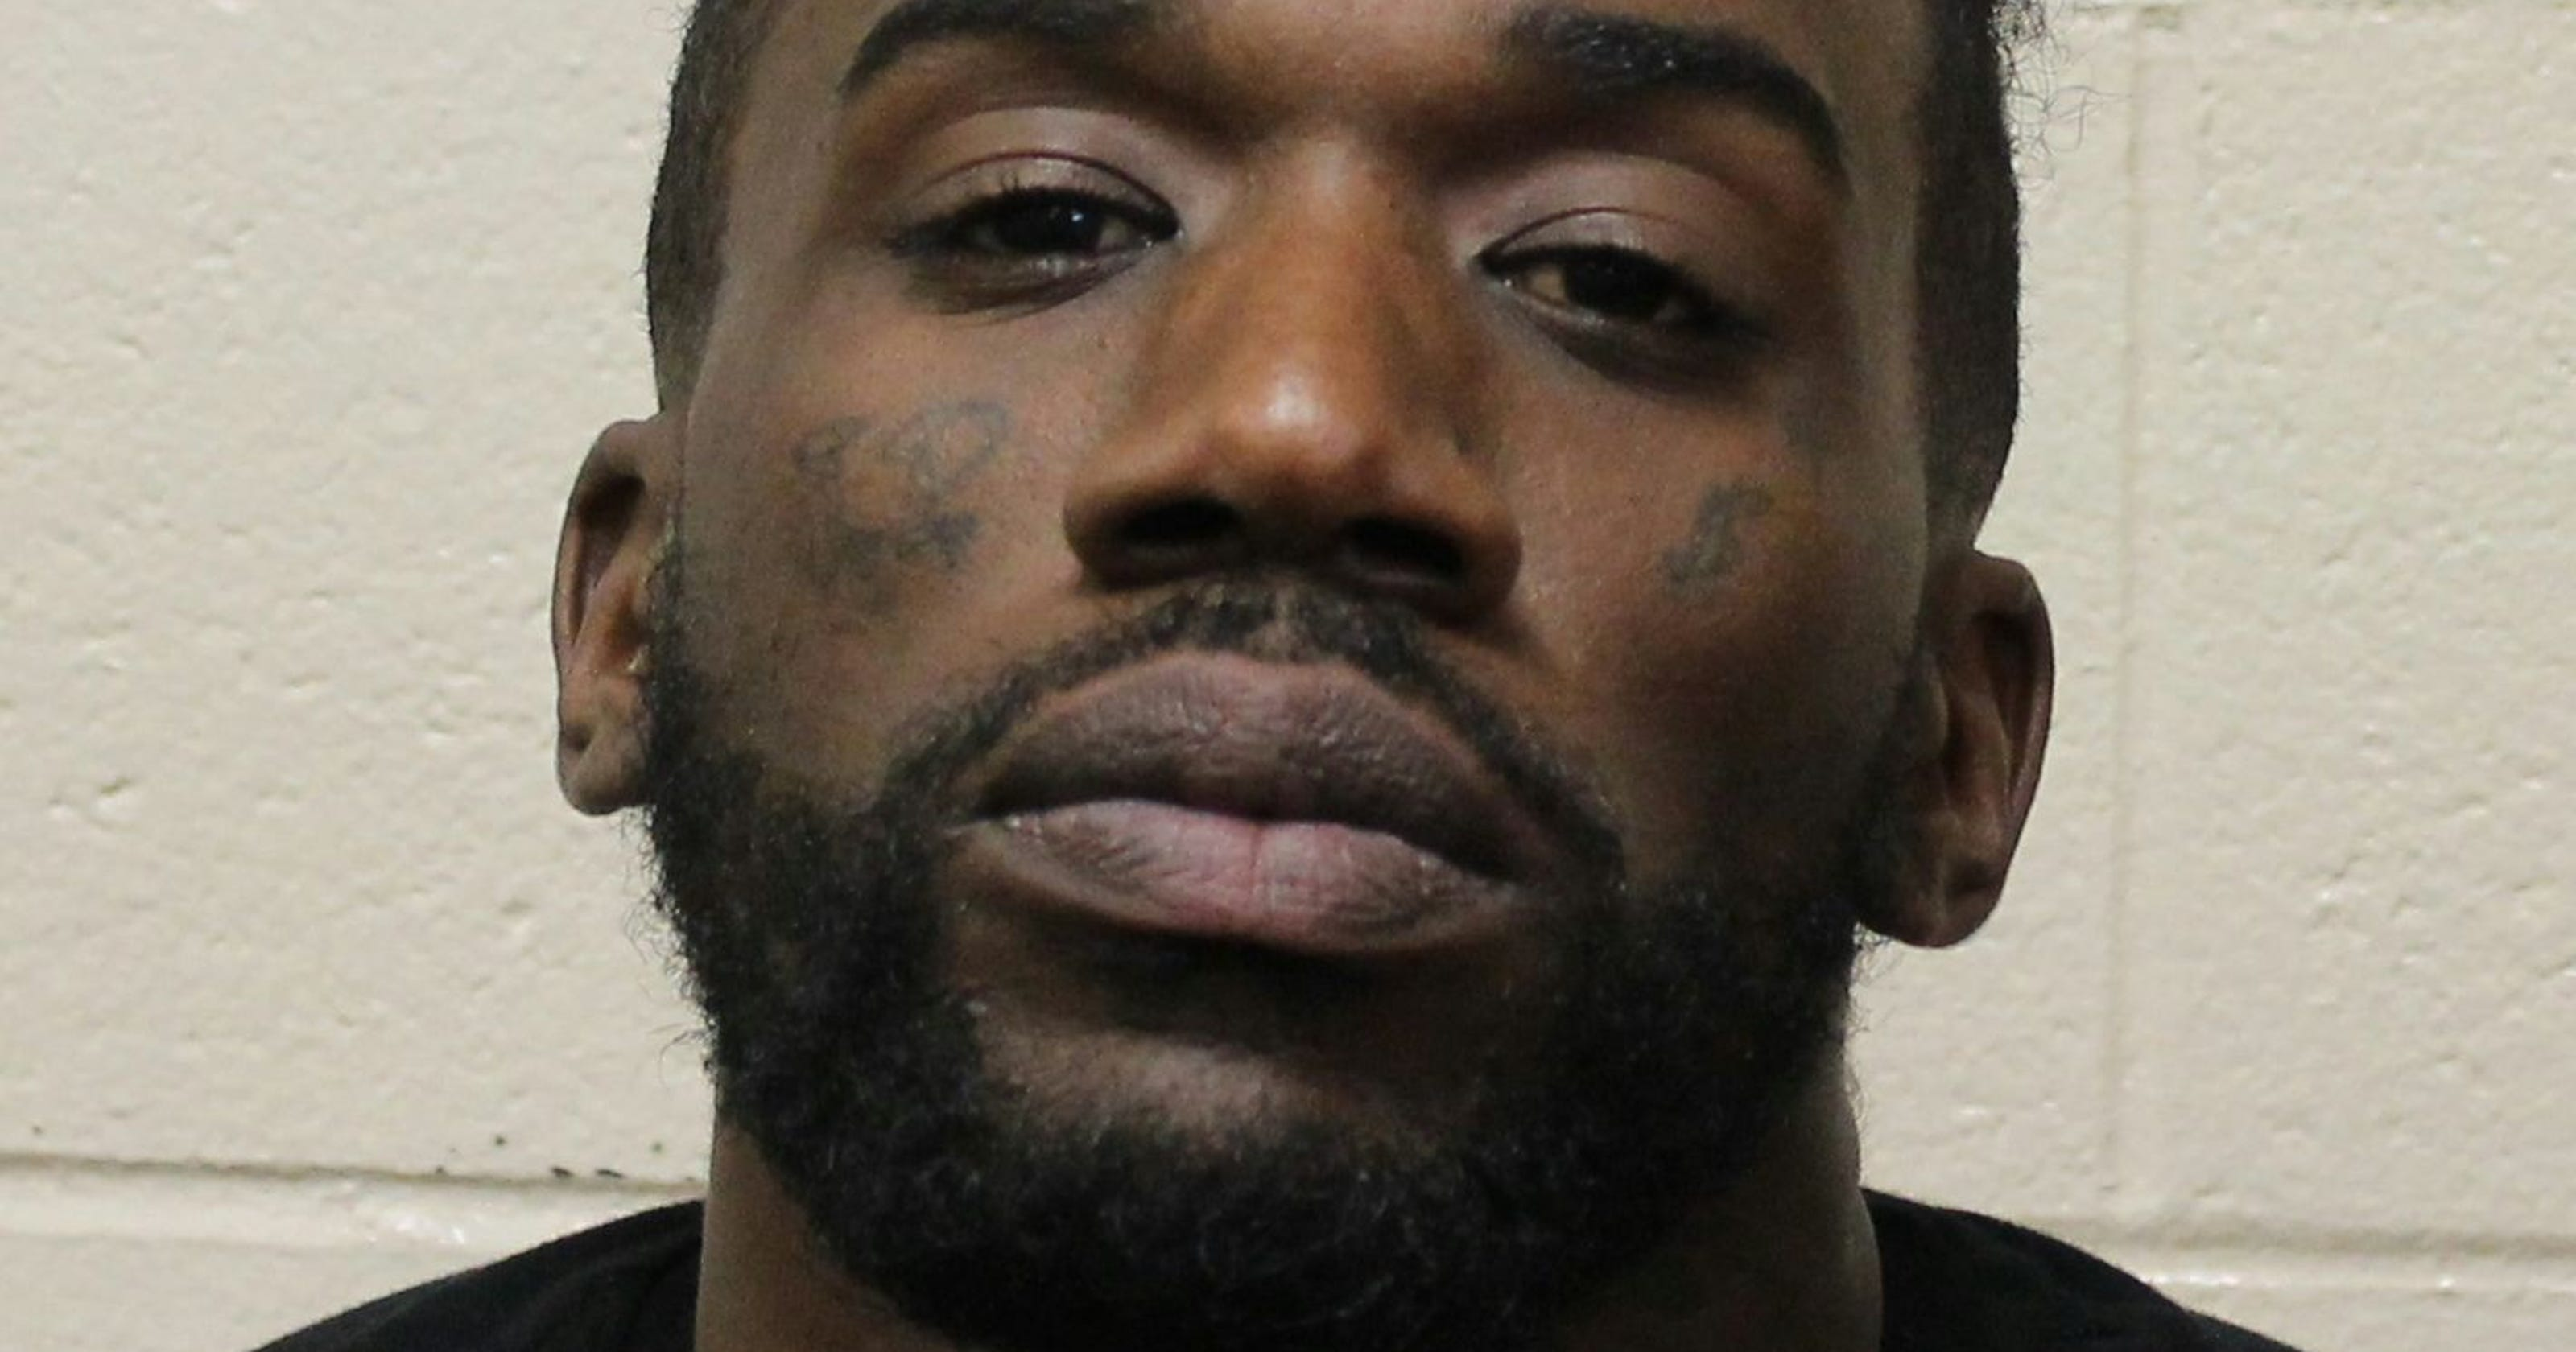 Wanted Salisbury man, cocaine found near JMB: Police